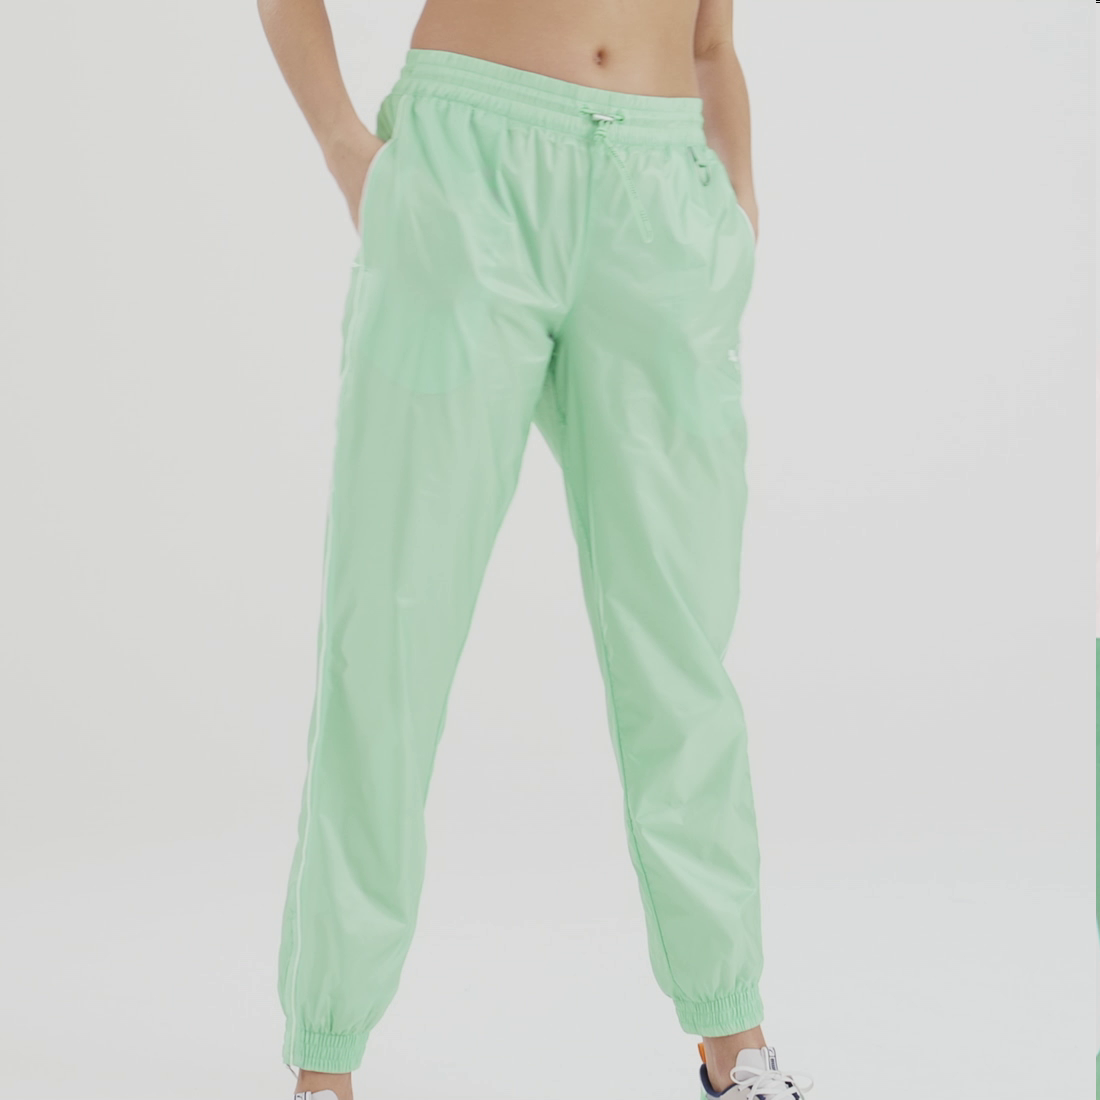 Imagen PUMA Pantalones deportivos Evide para mujer #7